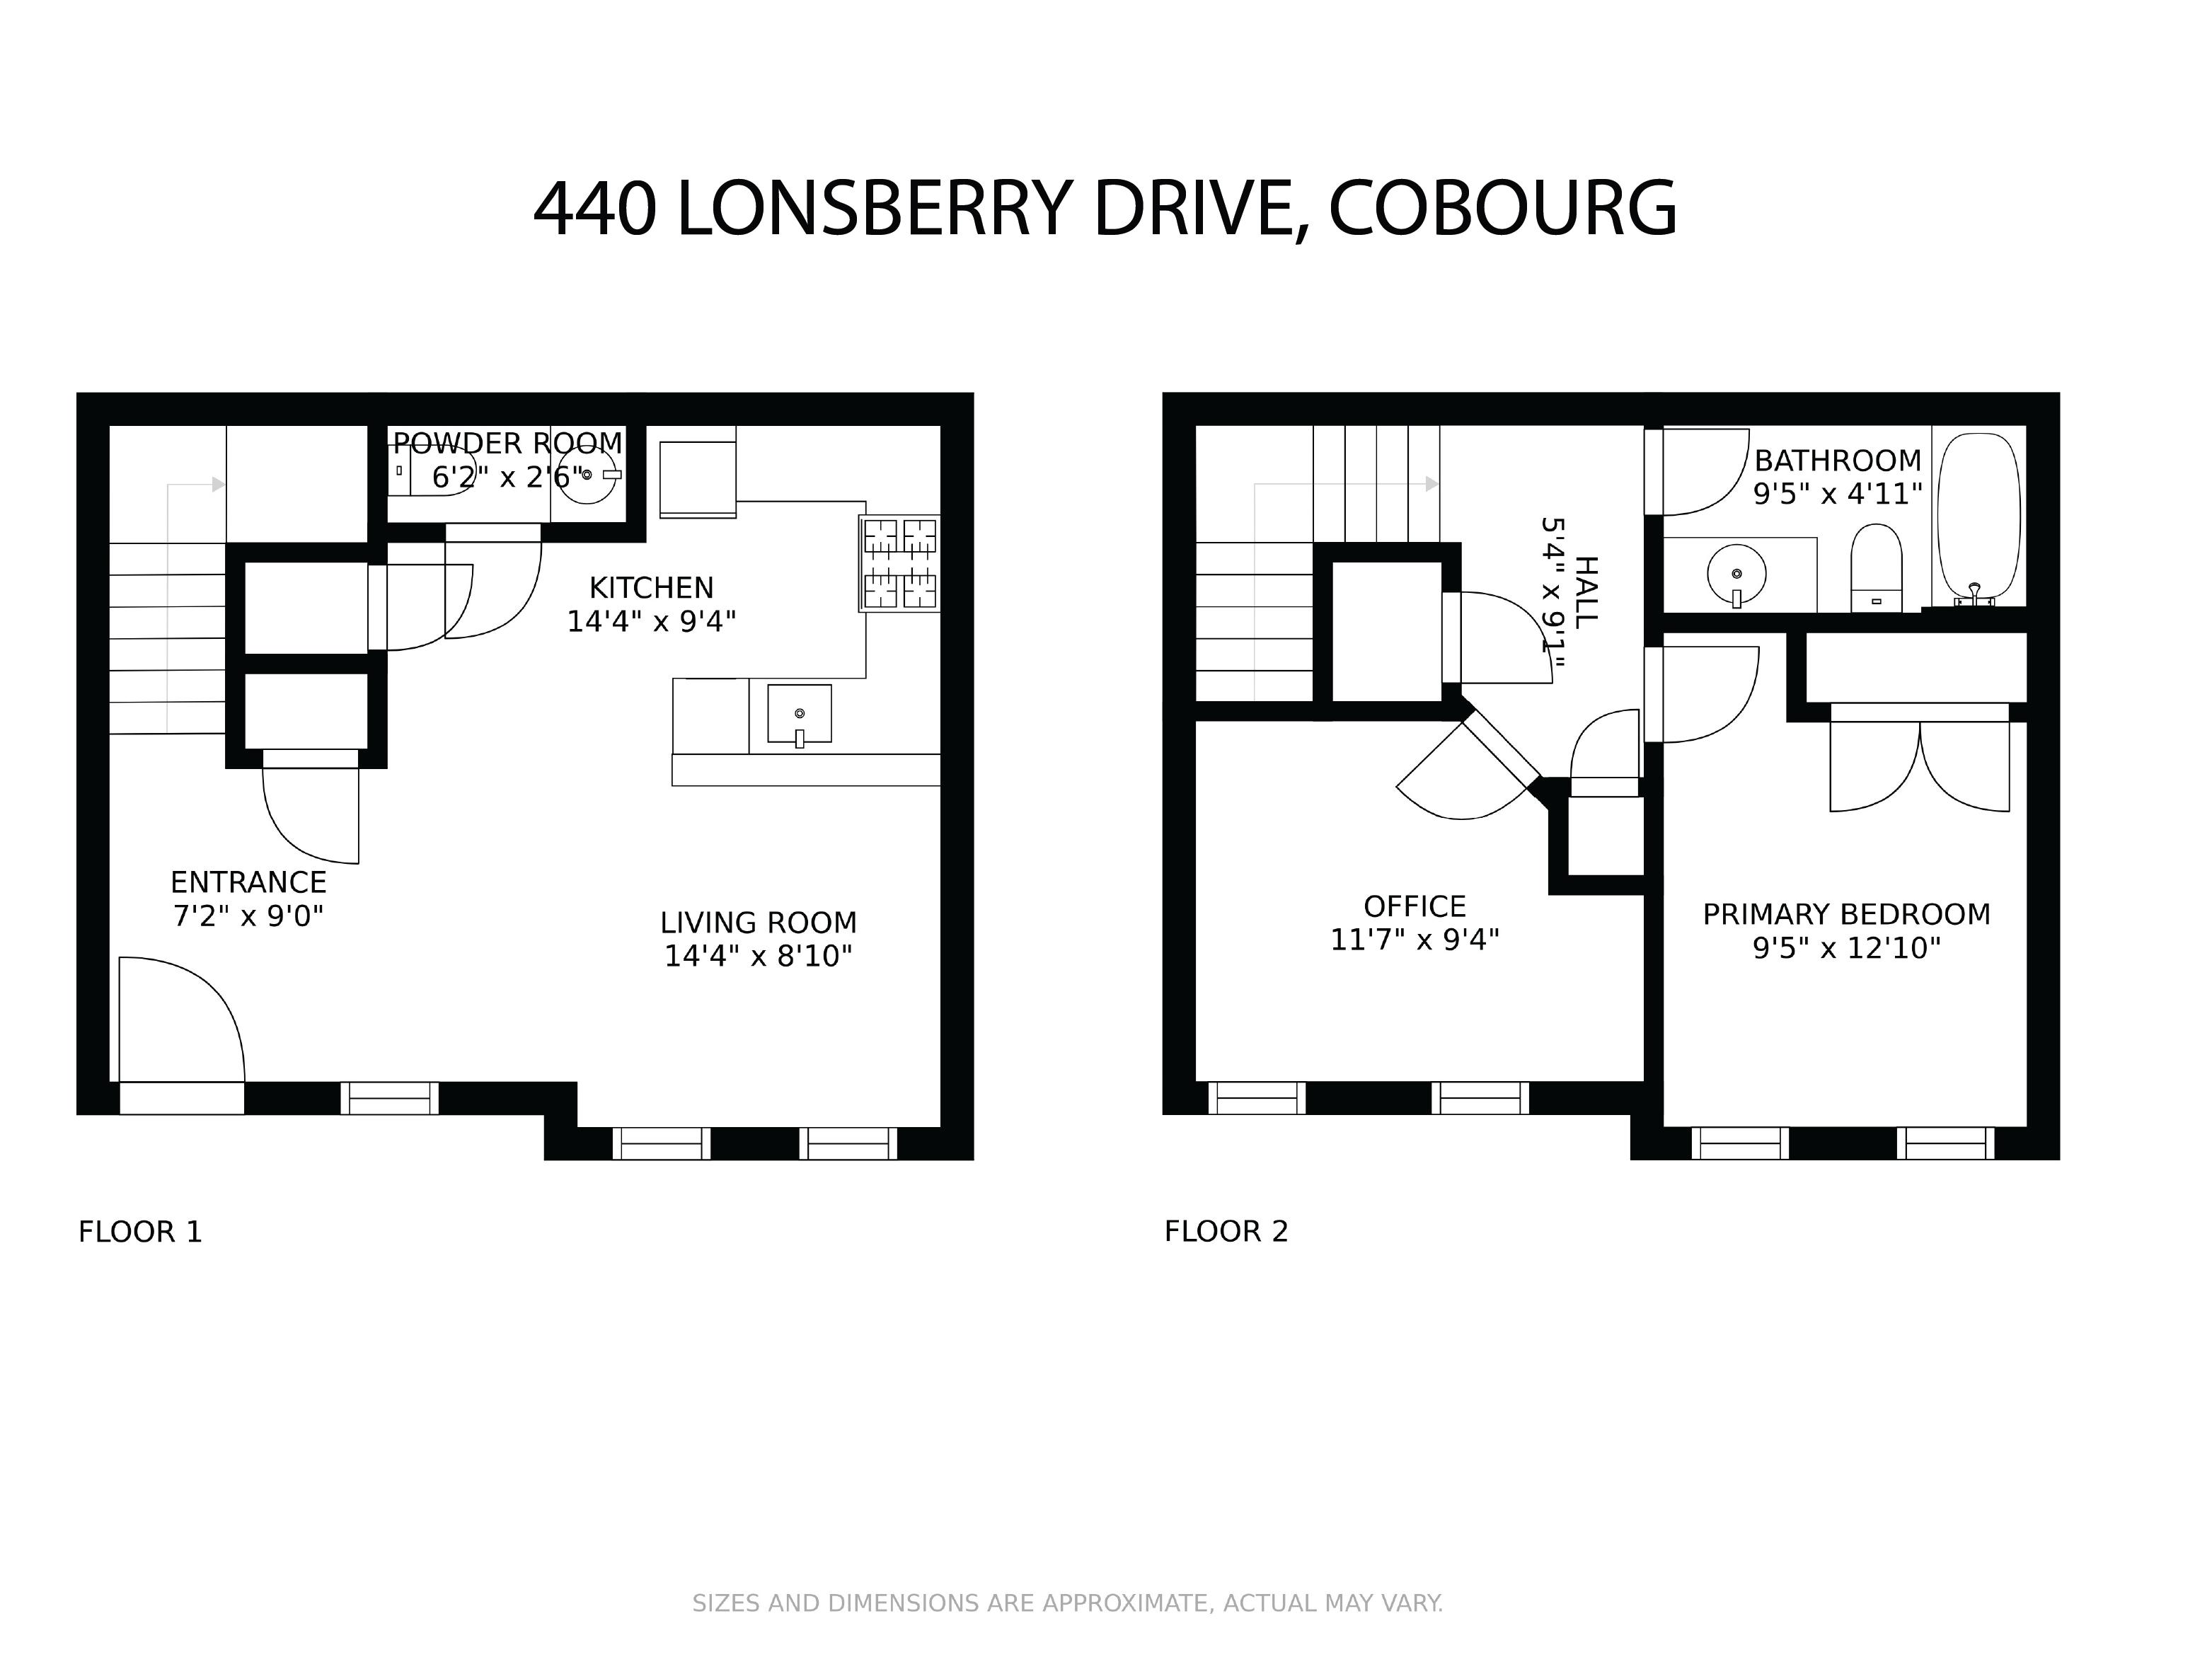 #209 – 440 Lonsberry Drive floorplan